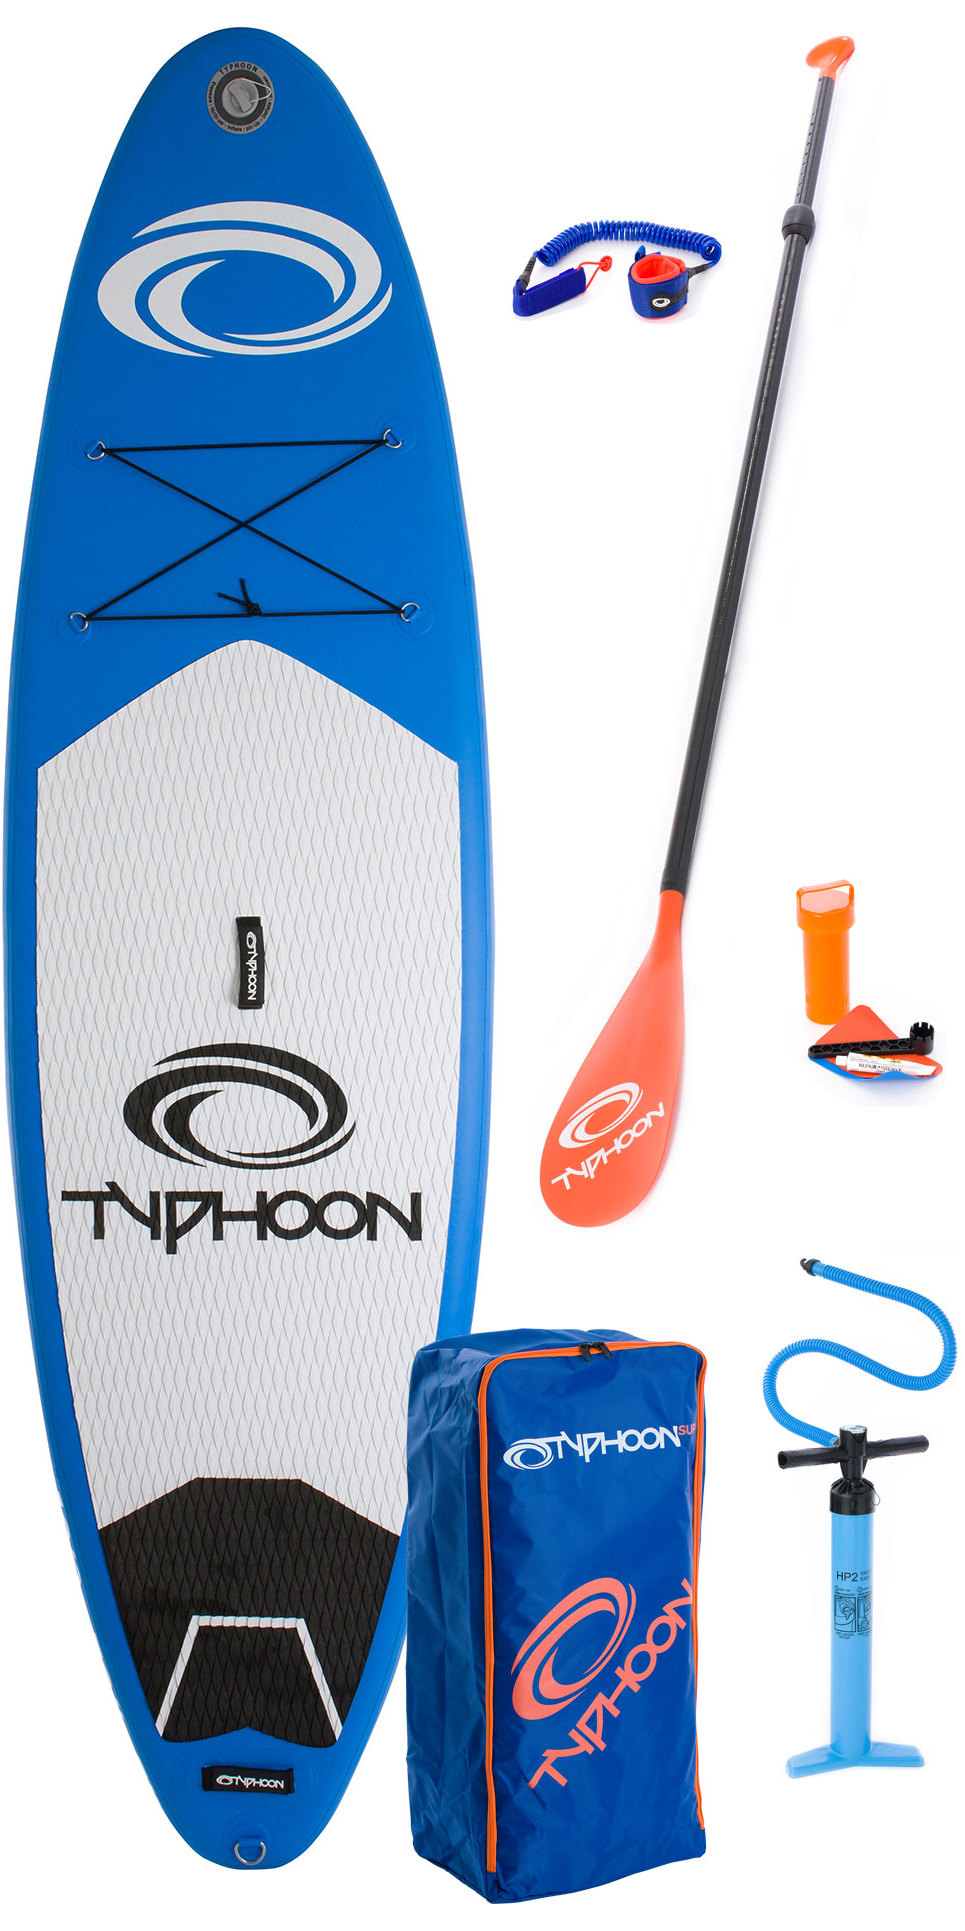 2019 Typhoon Inflatable SUP Package 10'2 Inc Board, Bag, Pump, Paddle & Leash 482113